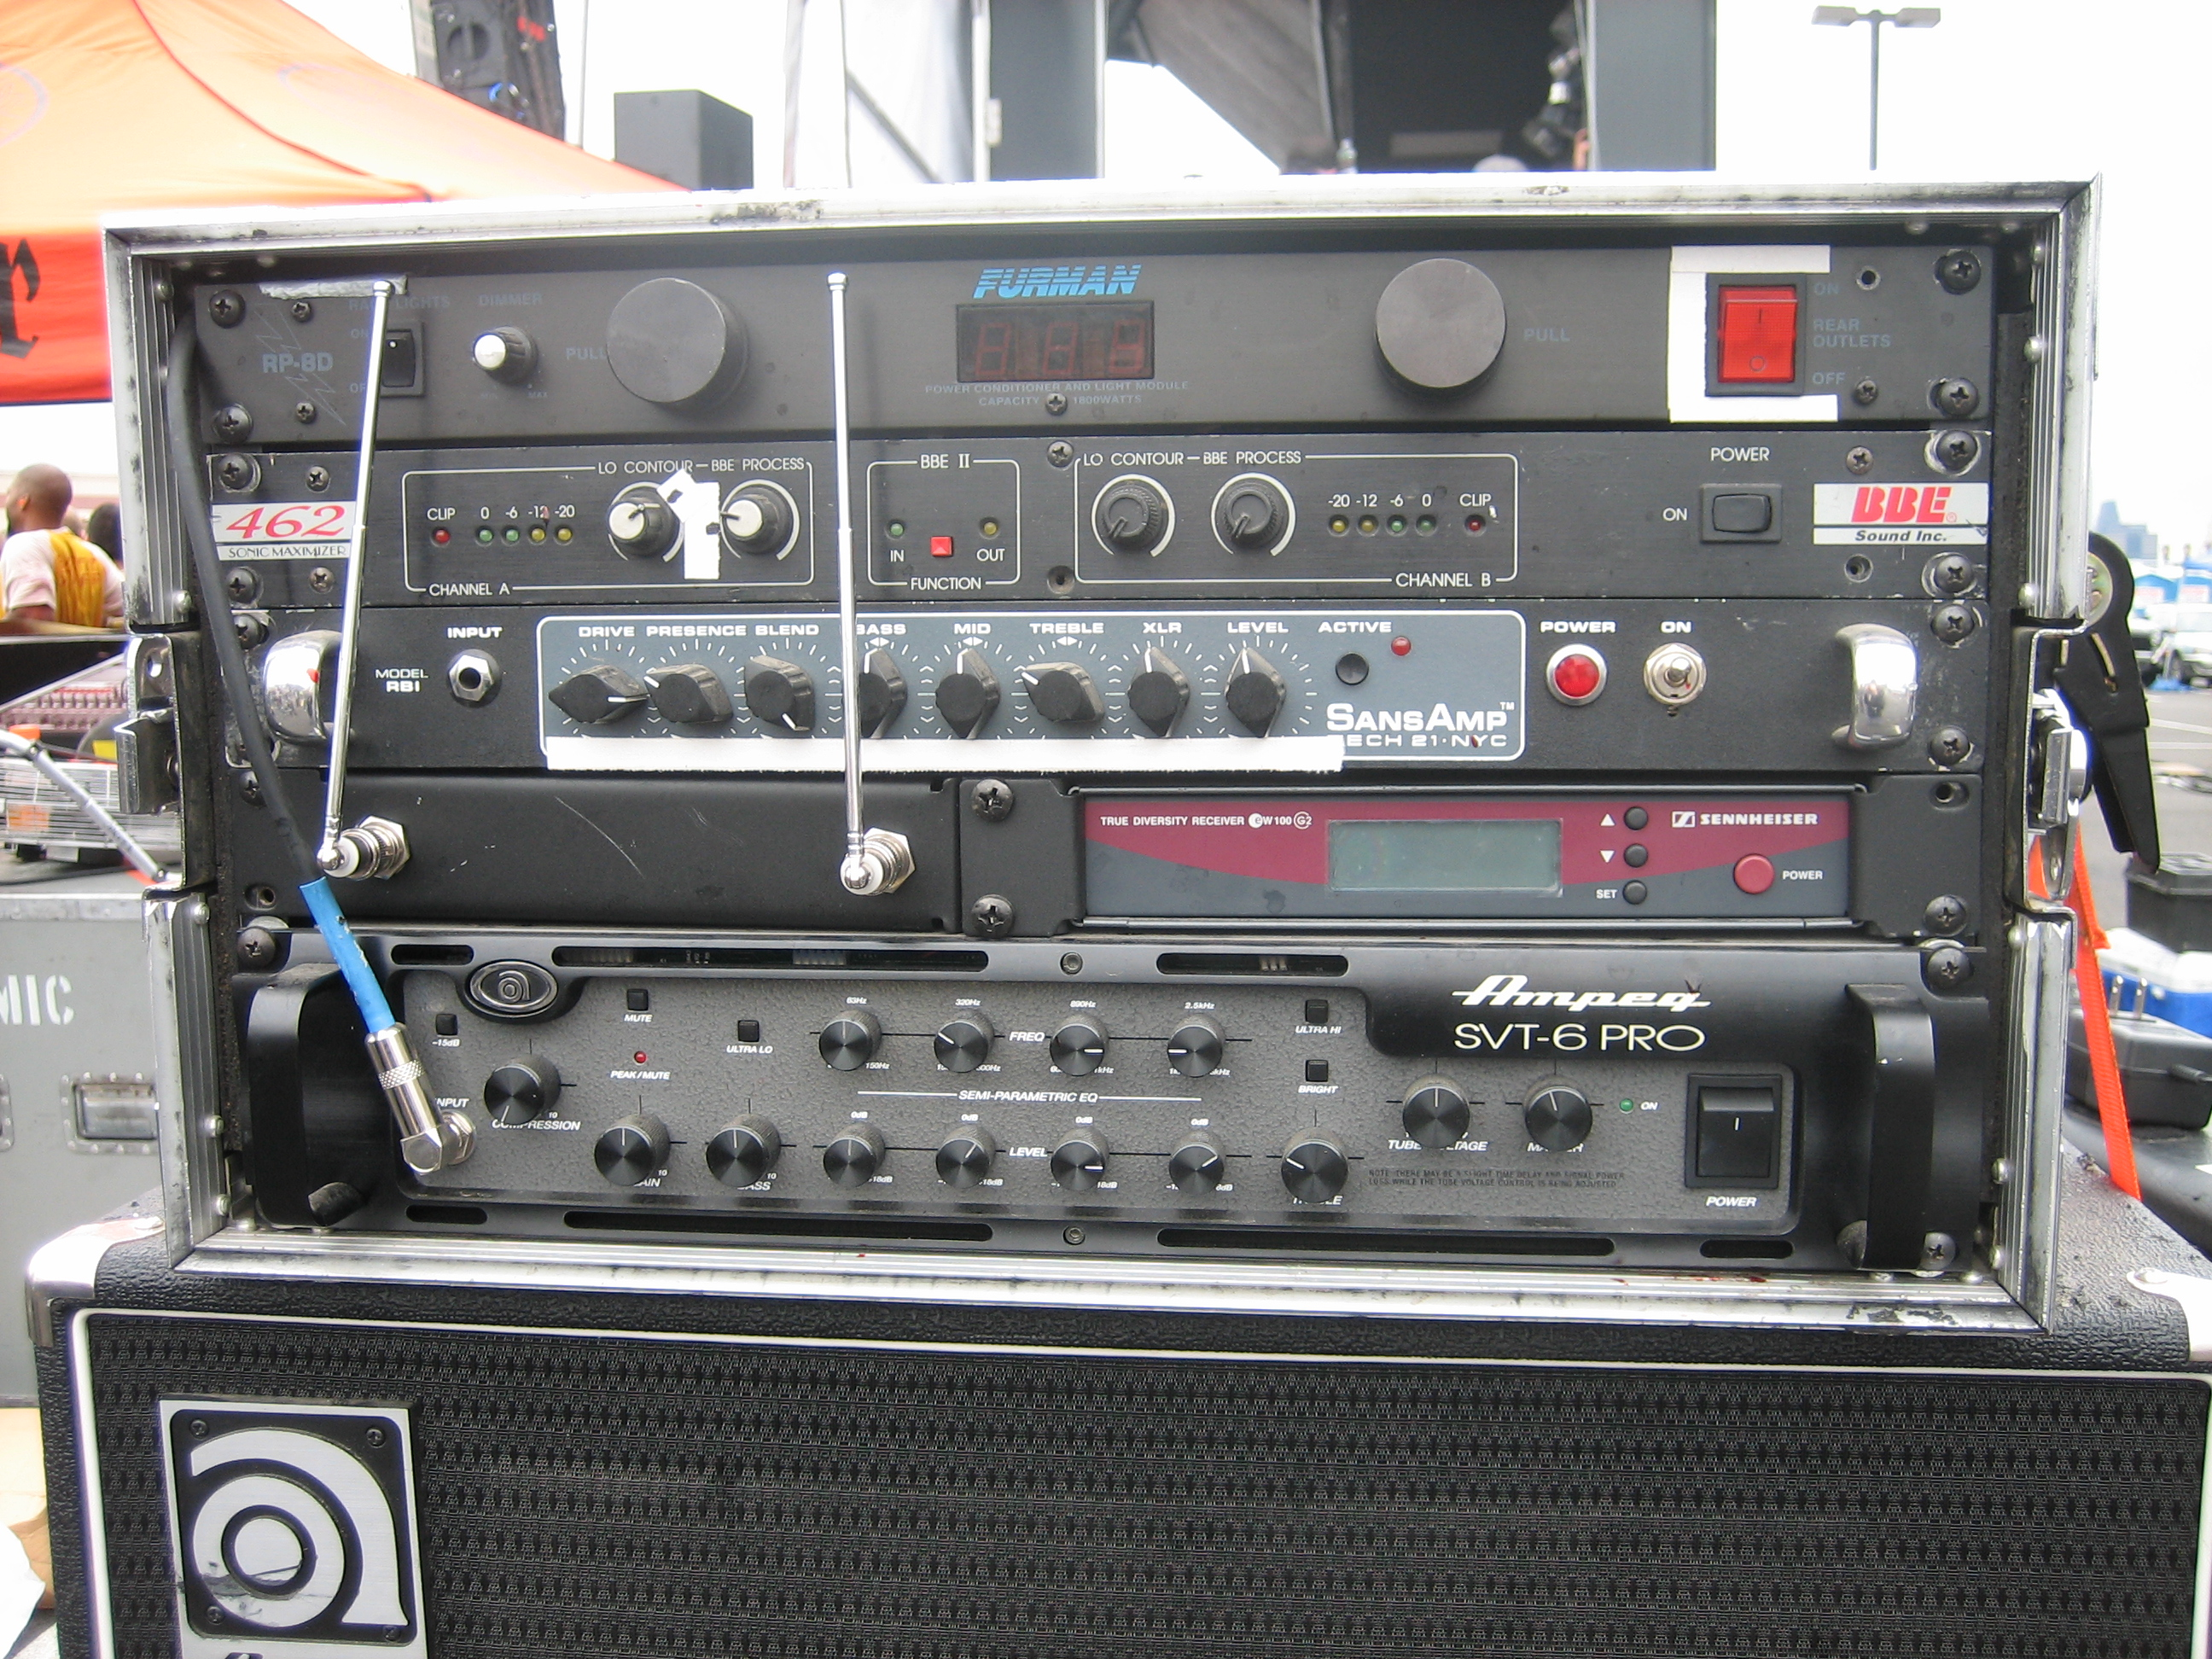 wiki bass amplifier upcscavenger. Black Bedroom Furniture Sets. Home Design Ideas